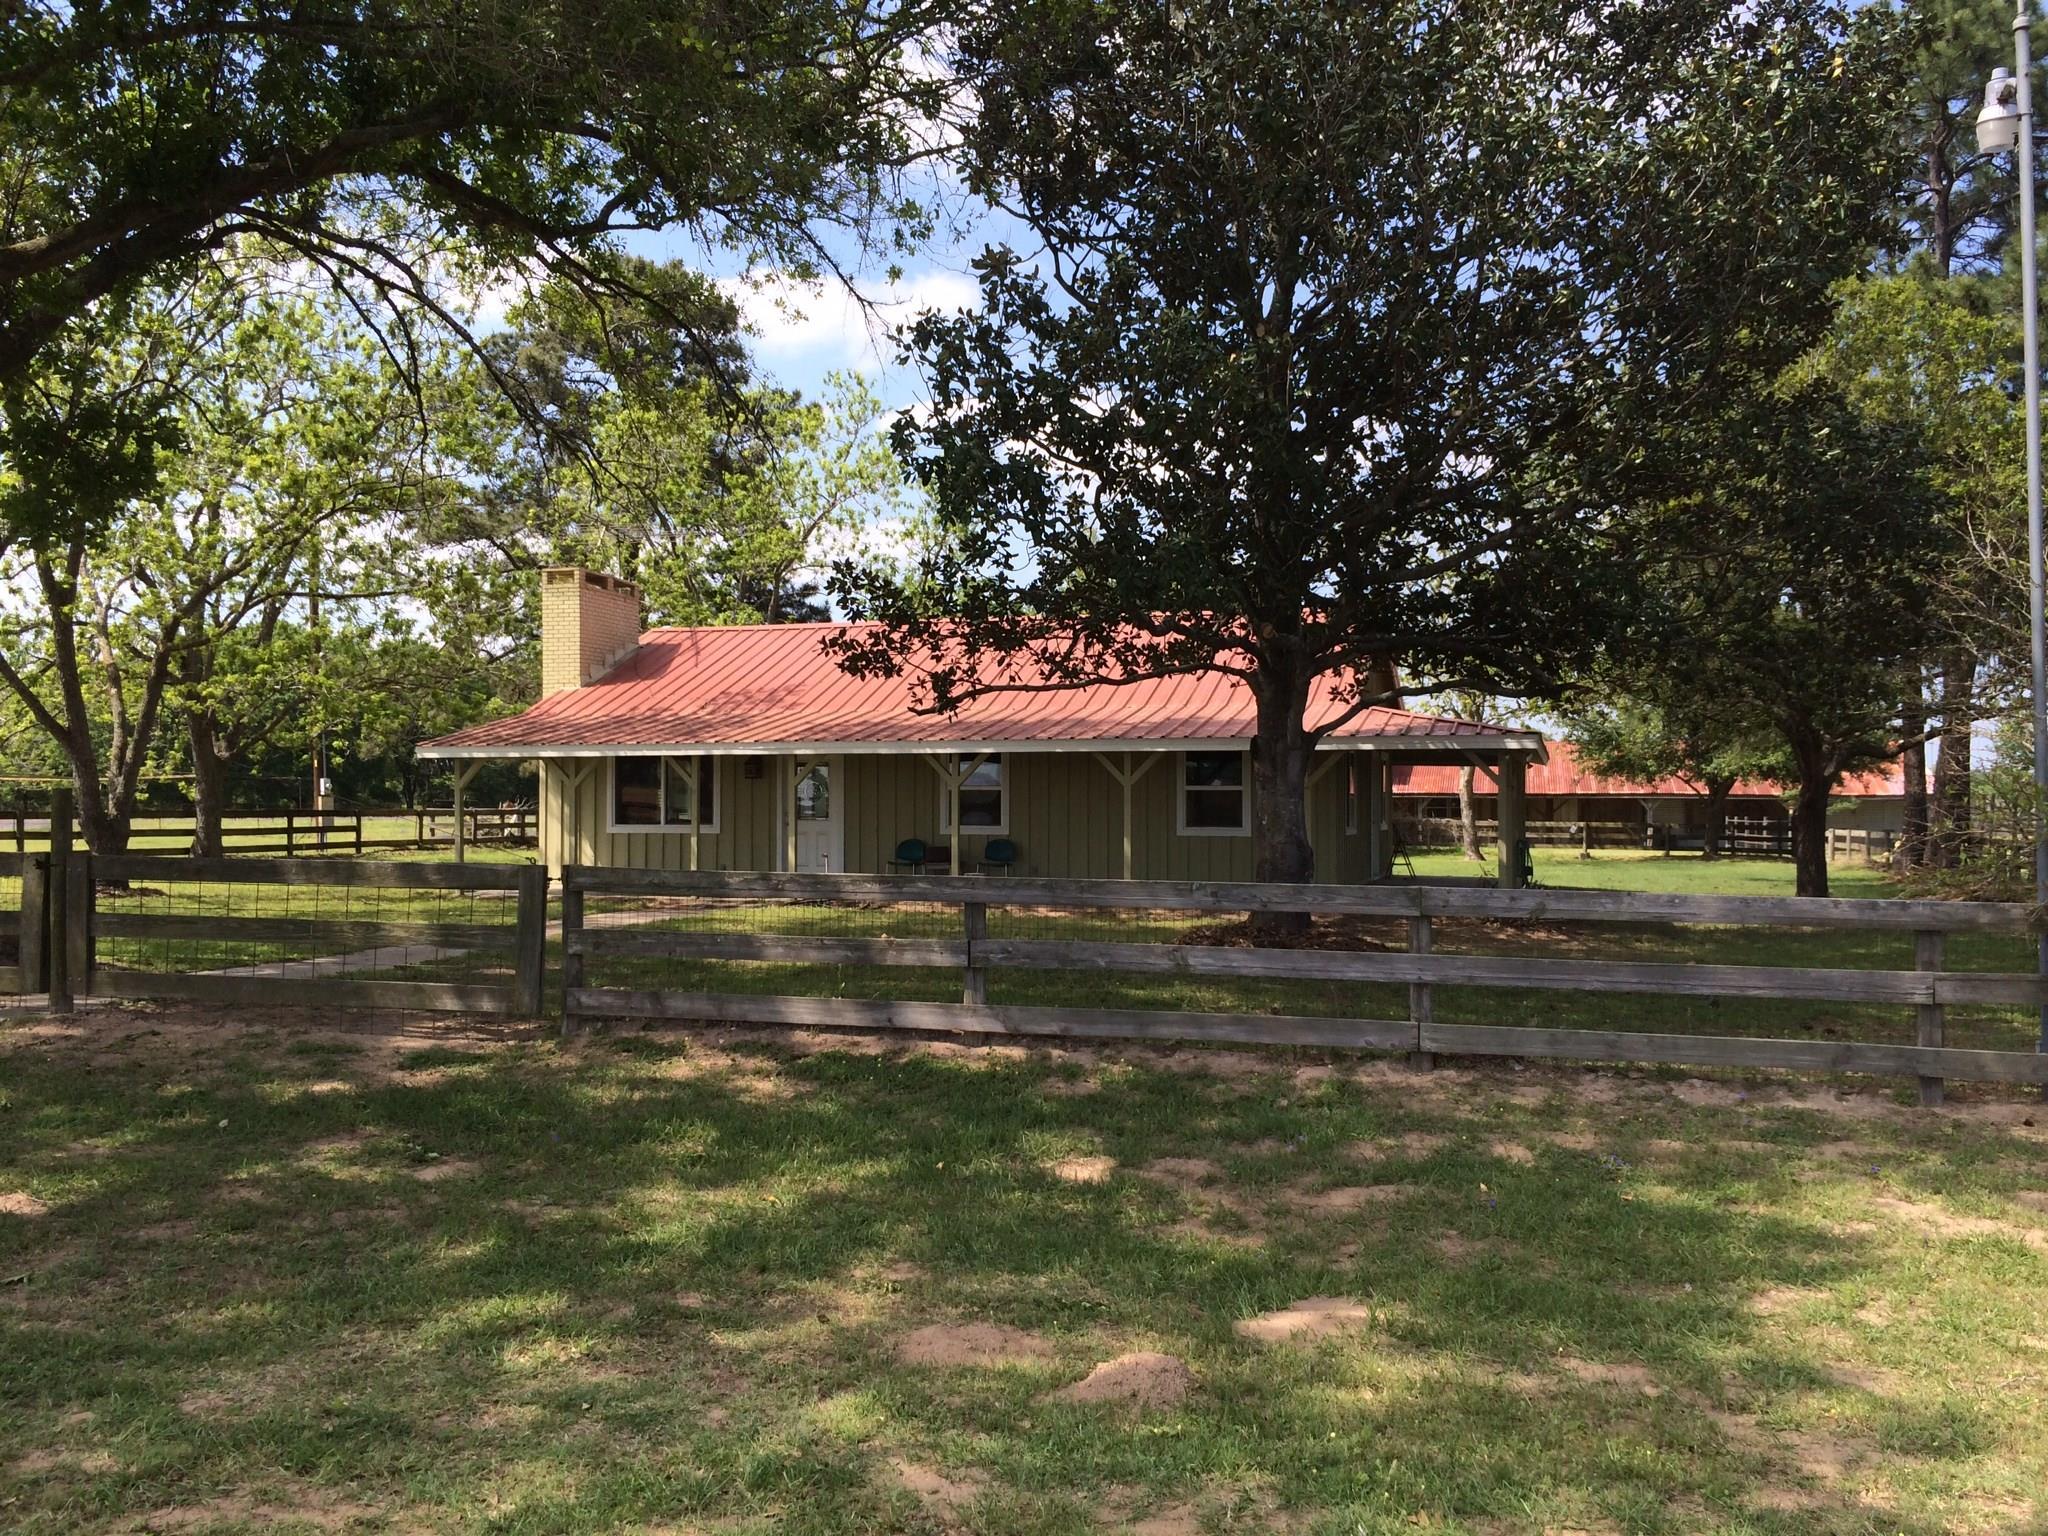 0 Fm 1488 Property Photo - Hempstead, TX real estate listing